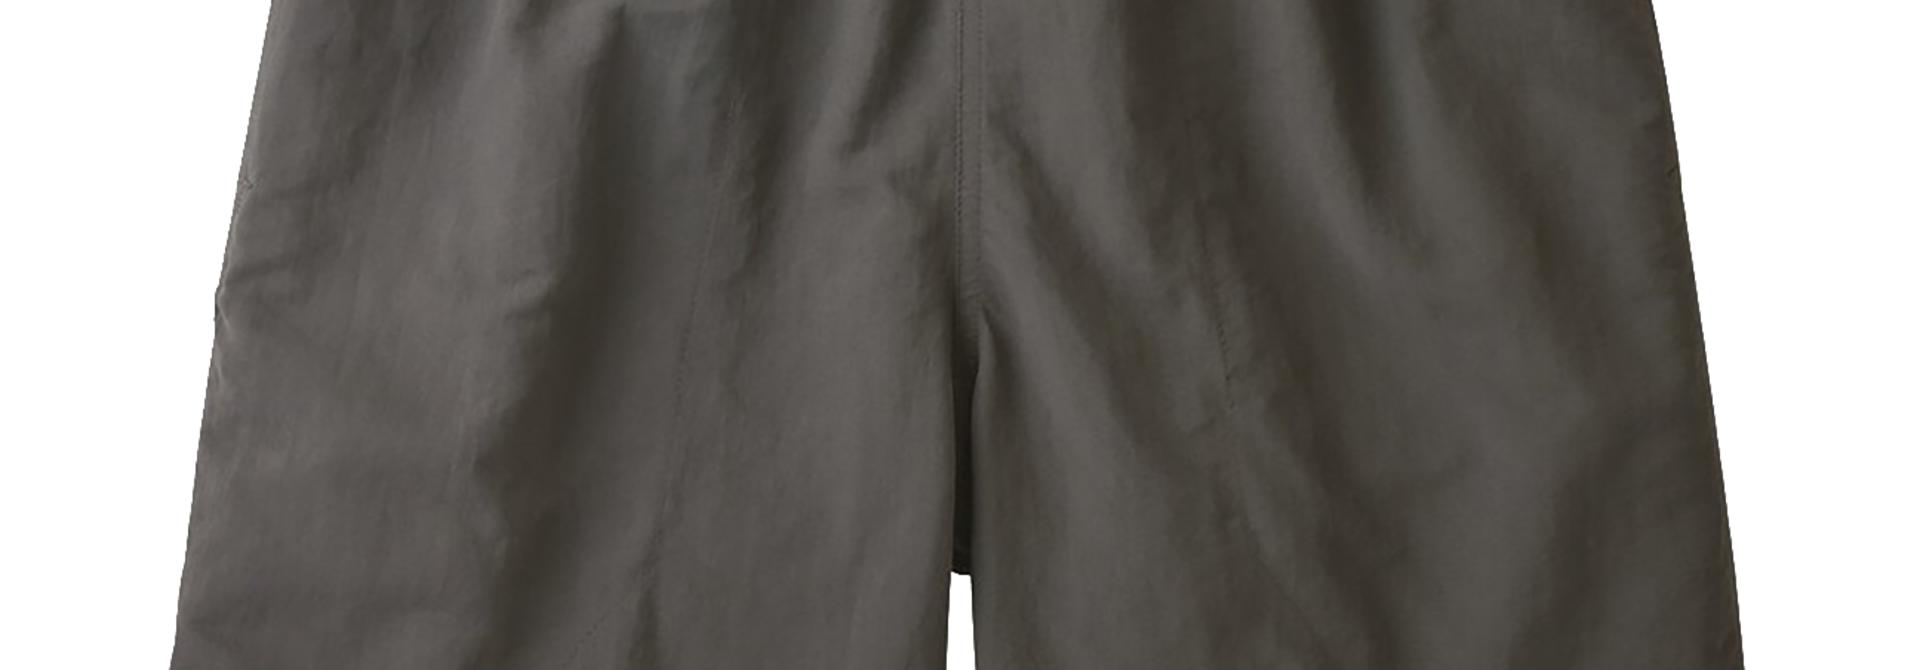 "Men's Baggies Shorts -5"", Forge Grey"